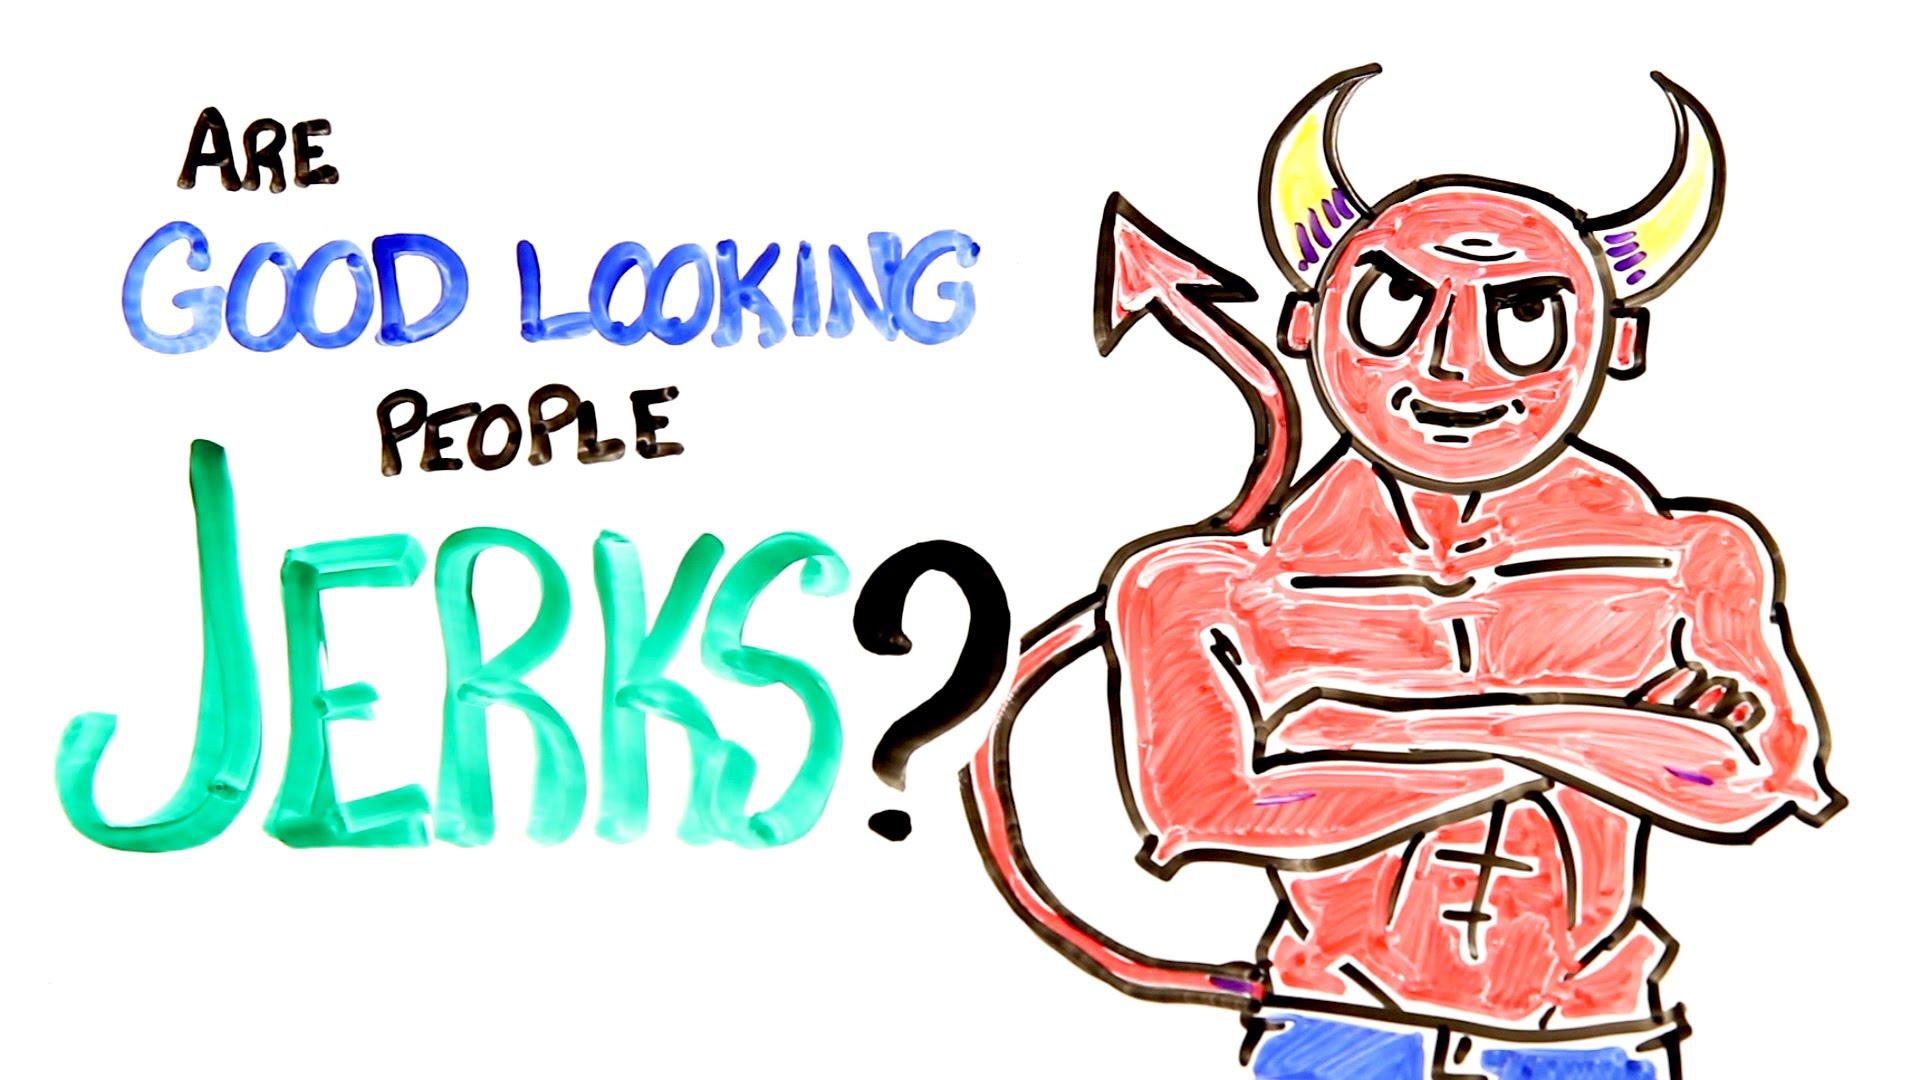 「為什麼很多帥哥跟正妹都很渣?」- Are Good-Looking People Jerks?